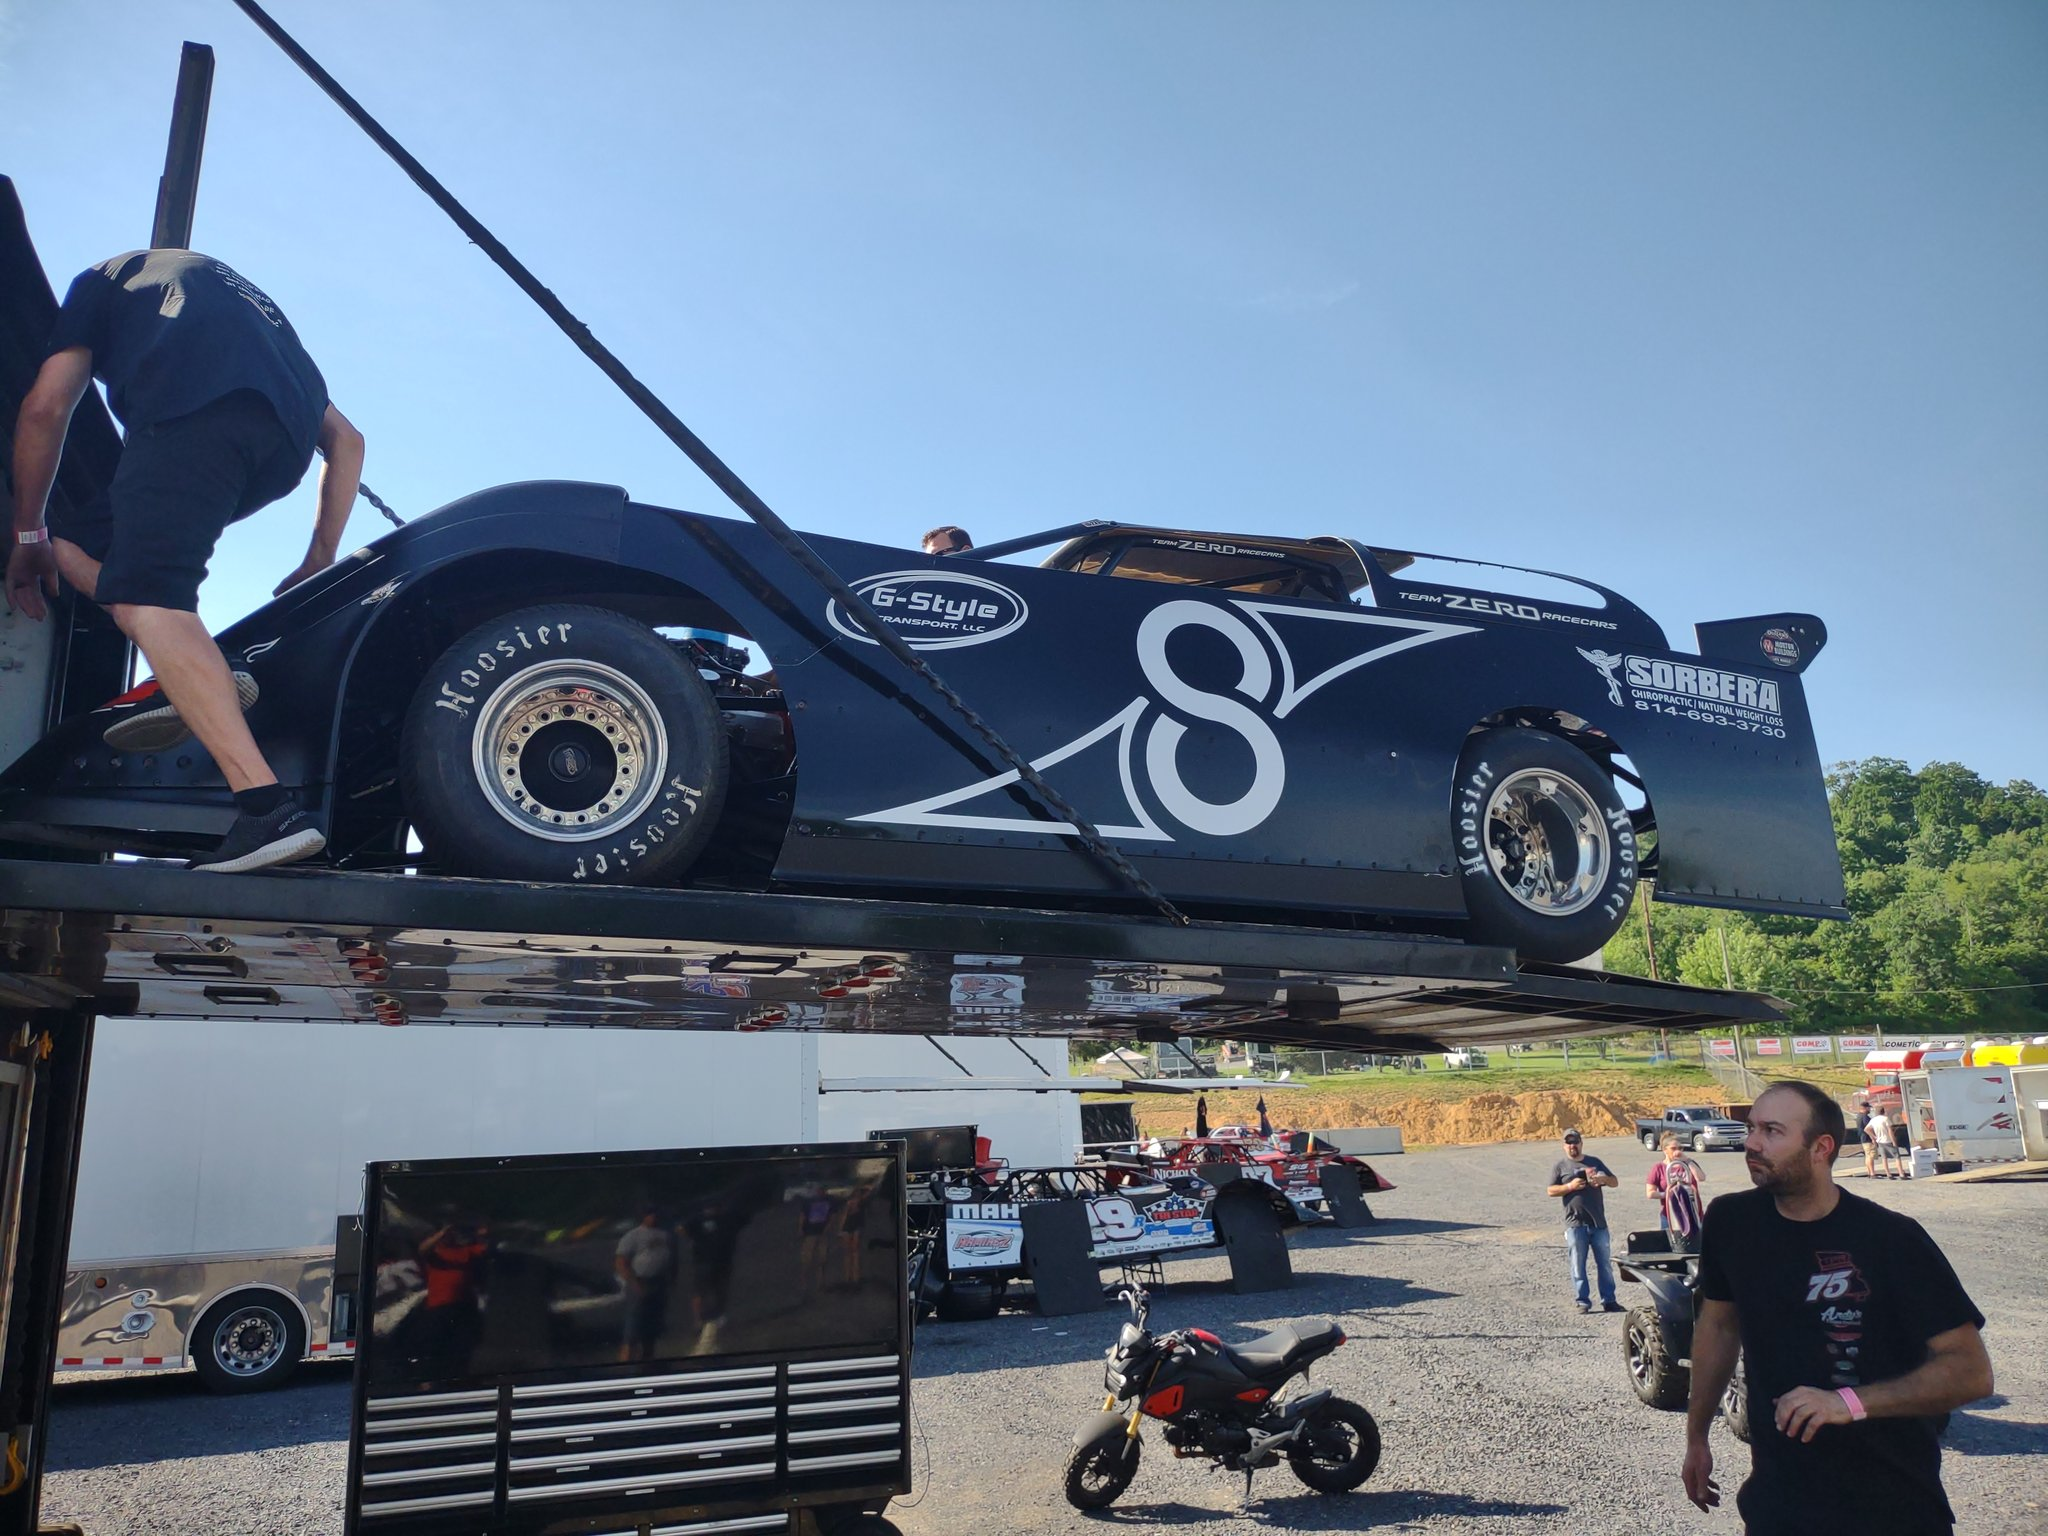 Kyle Strickler - Scott Bloomquist Racing - Dirt Late Model